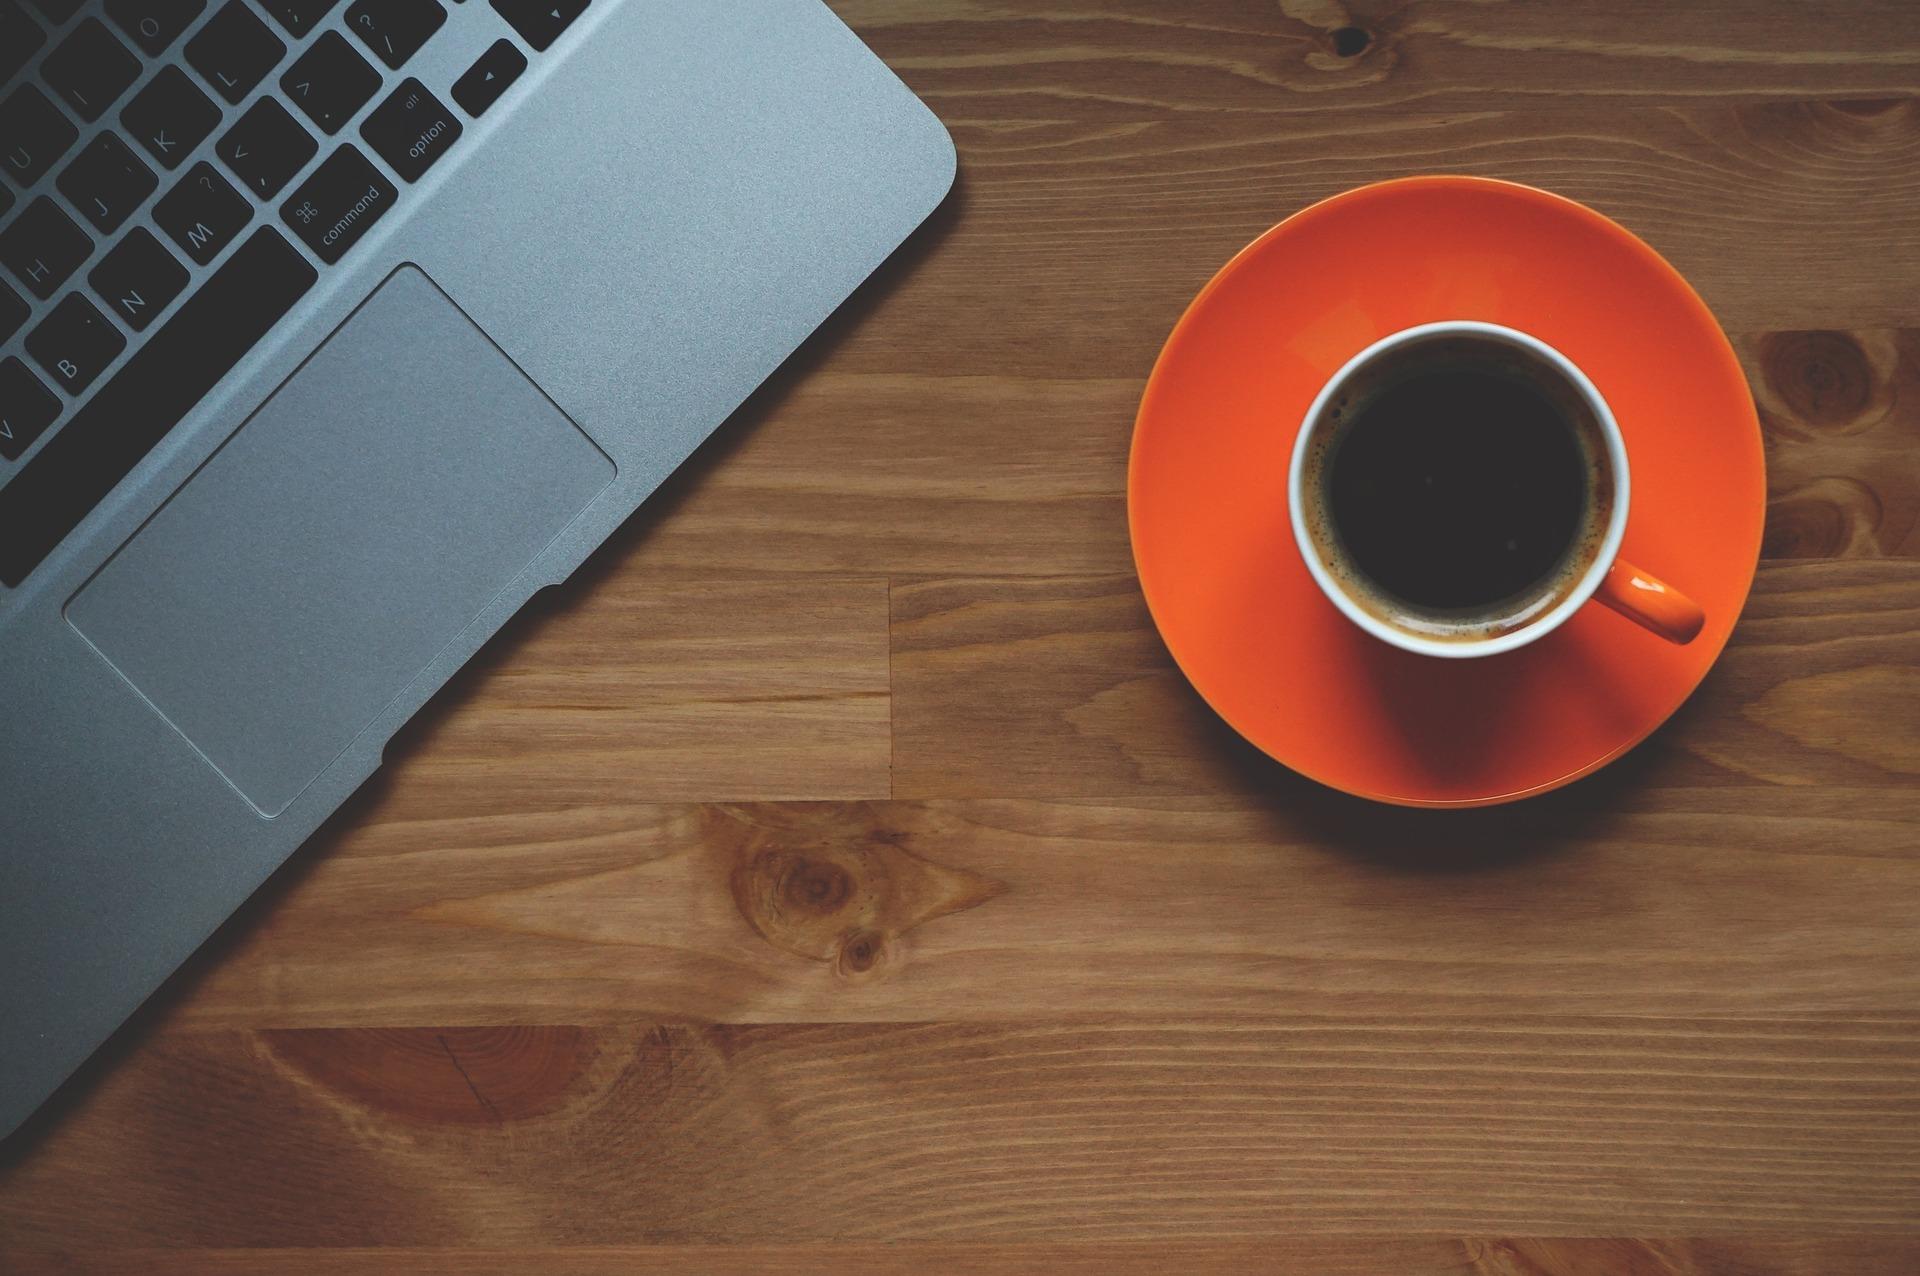 taza de cafe, ordenador, portatil, macbook, oficina, cafe - Fondos de Pantalla - professor-falken.com